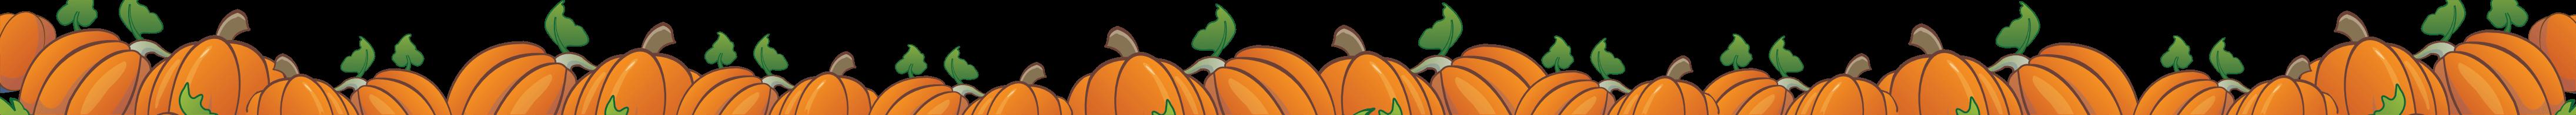 Drunk pumpkin clipart banner black and white library MazePlay | Local Corn Maze Finder | Corn Mazes banner black and white library